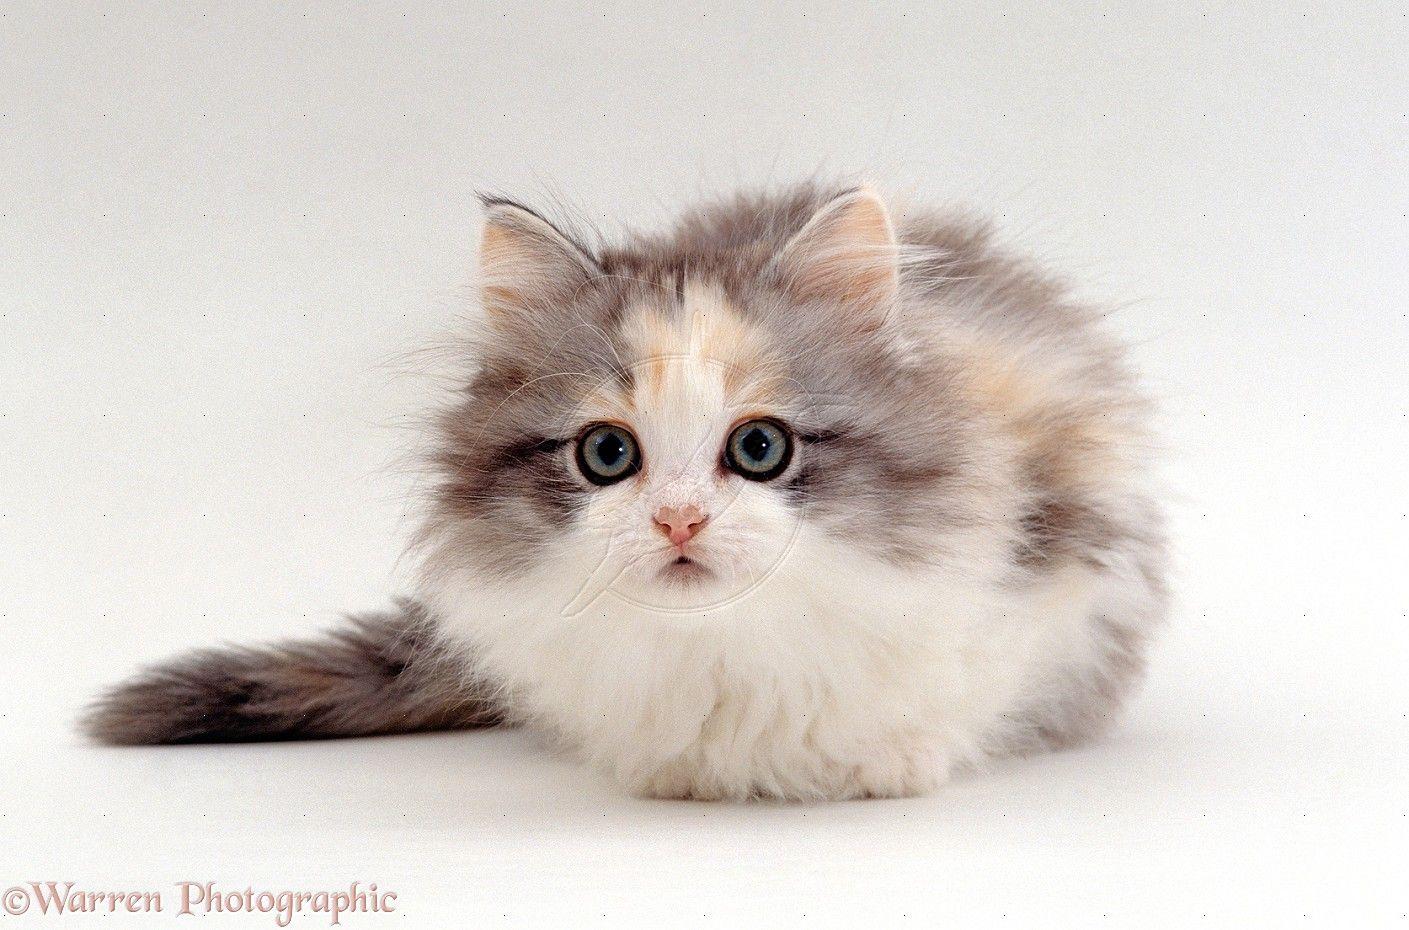 Fluffy Kitten Wallpapers Background Fluffy Kittens Kittens Cutest Cute Fluffy Kittens